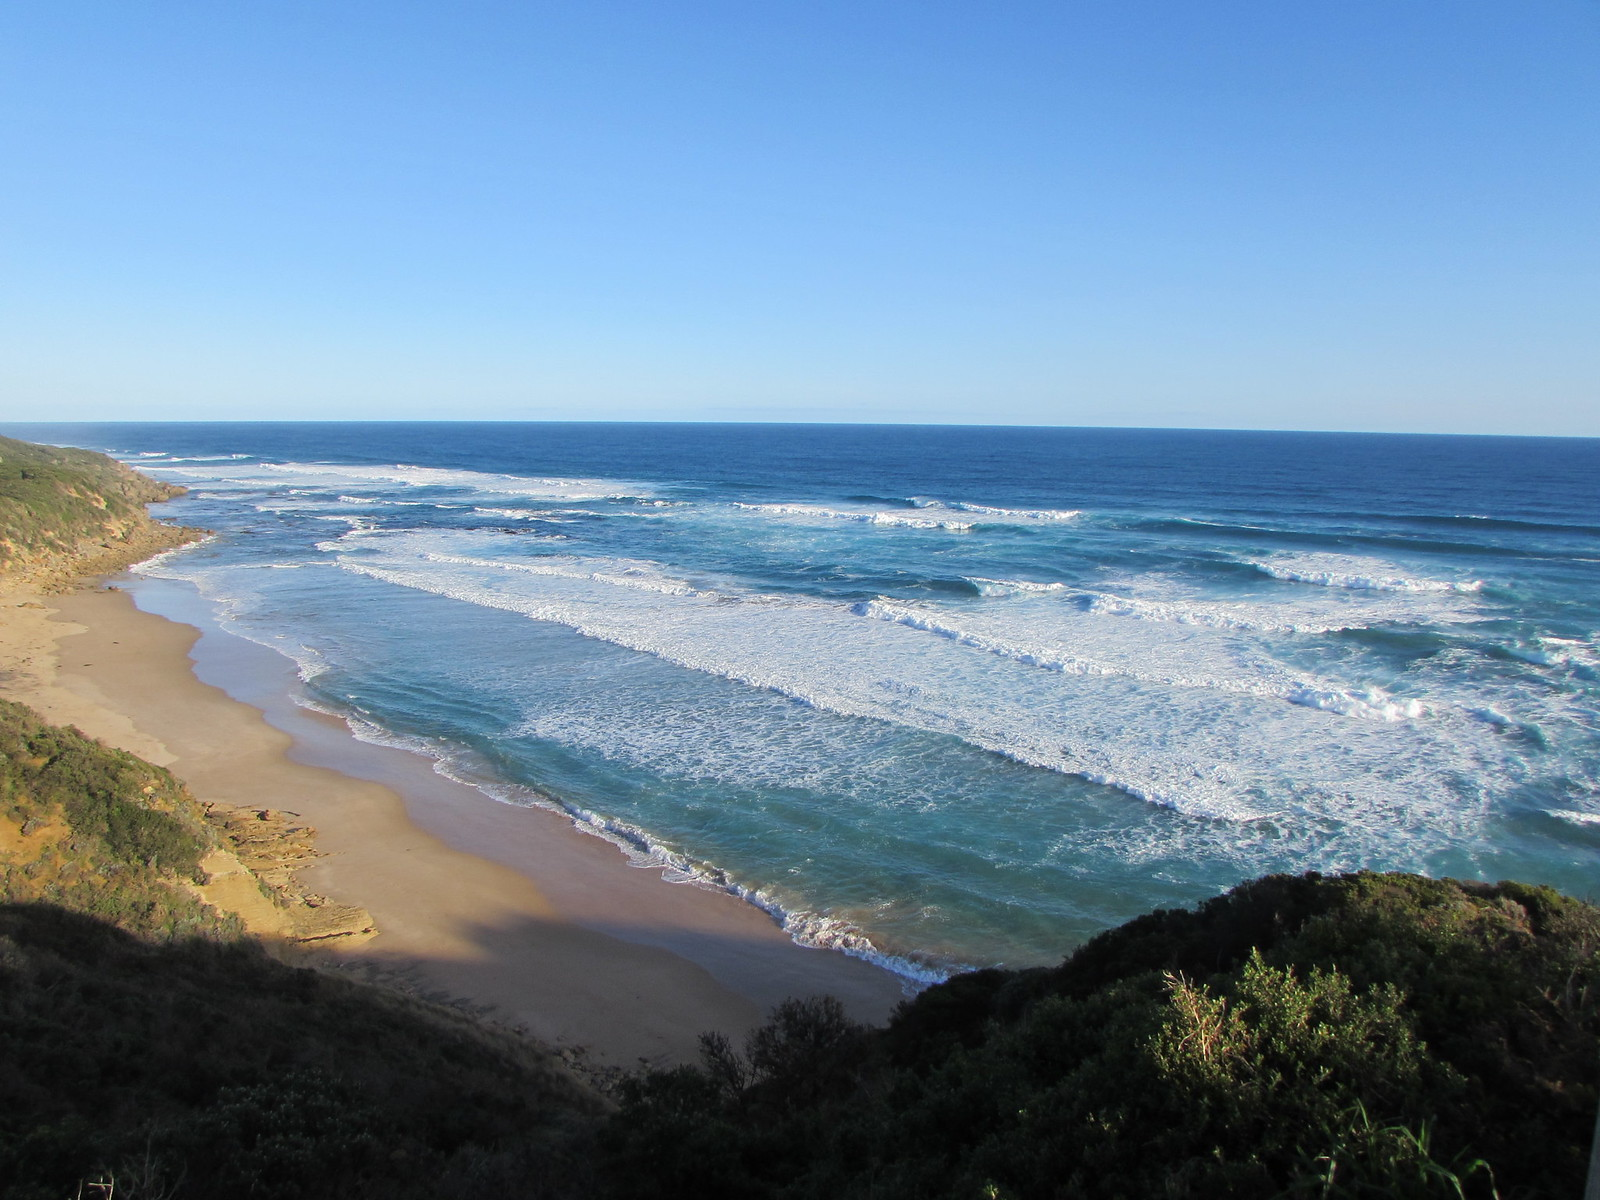 Getting close to Johanna Beach